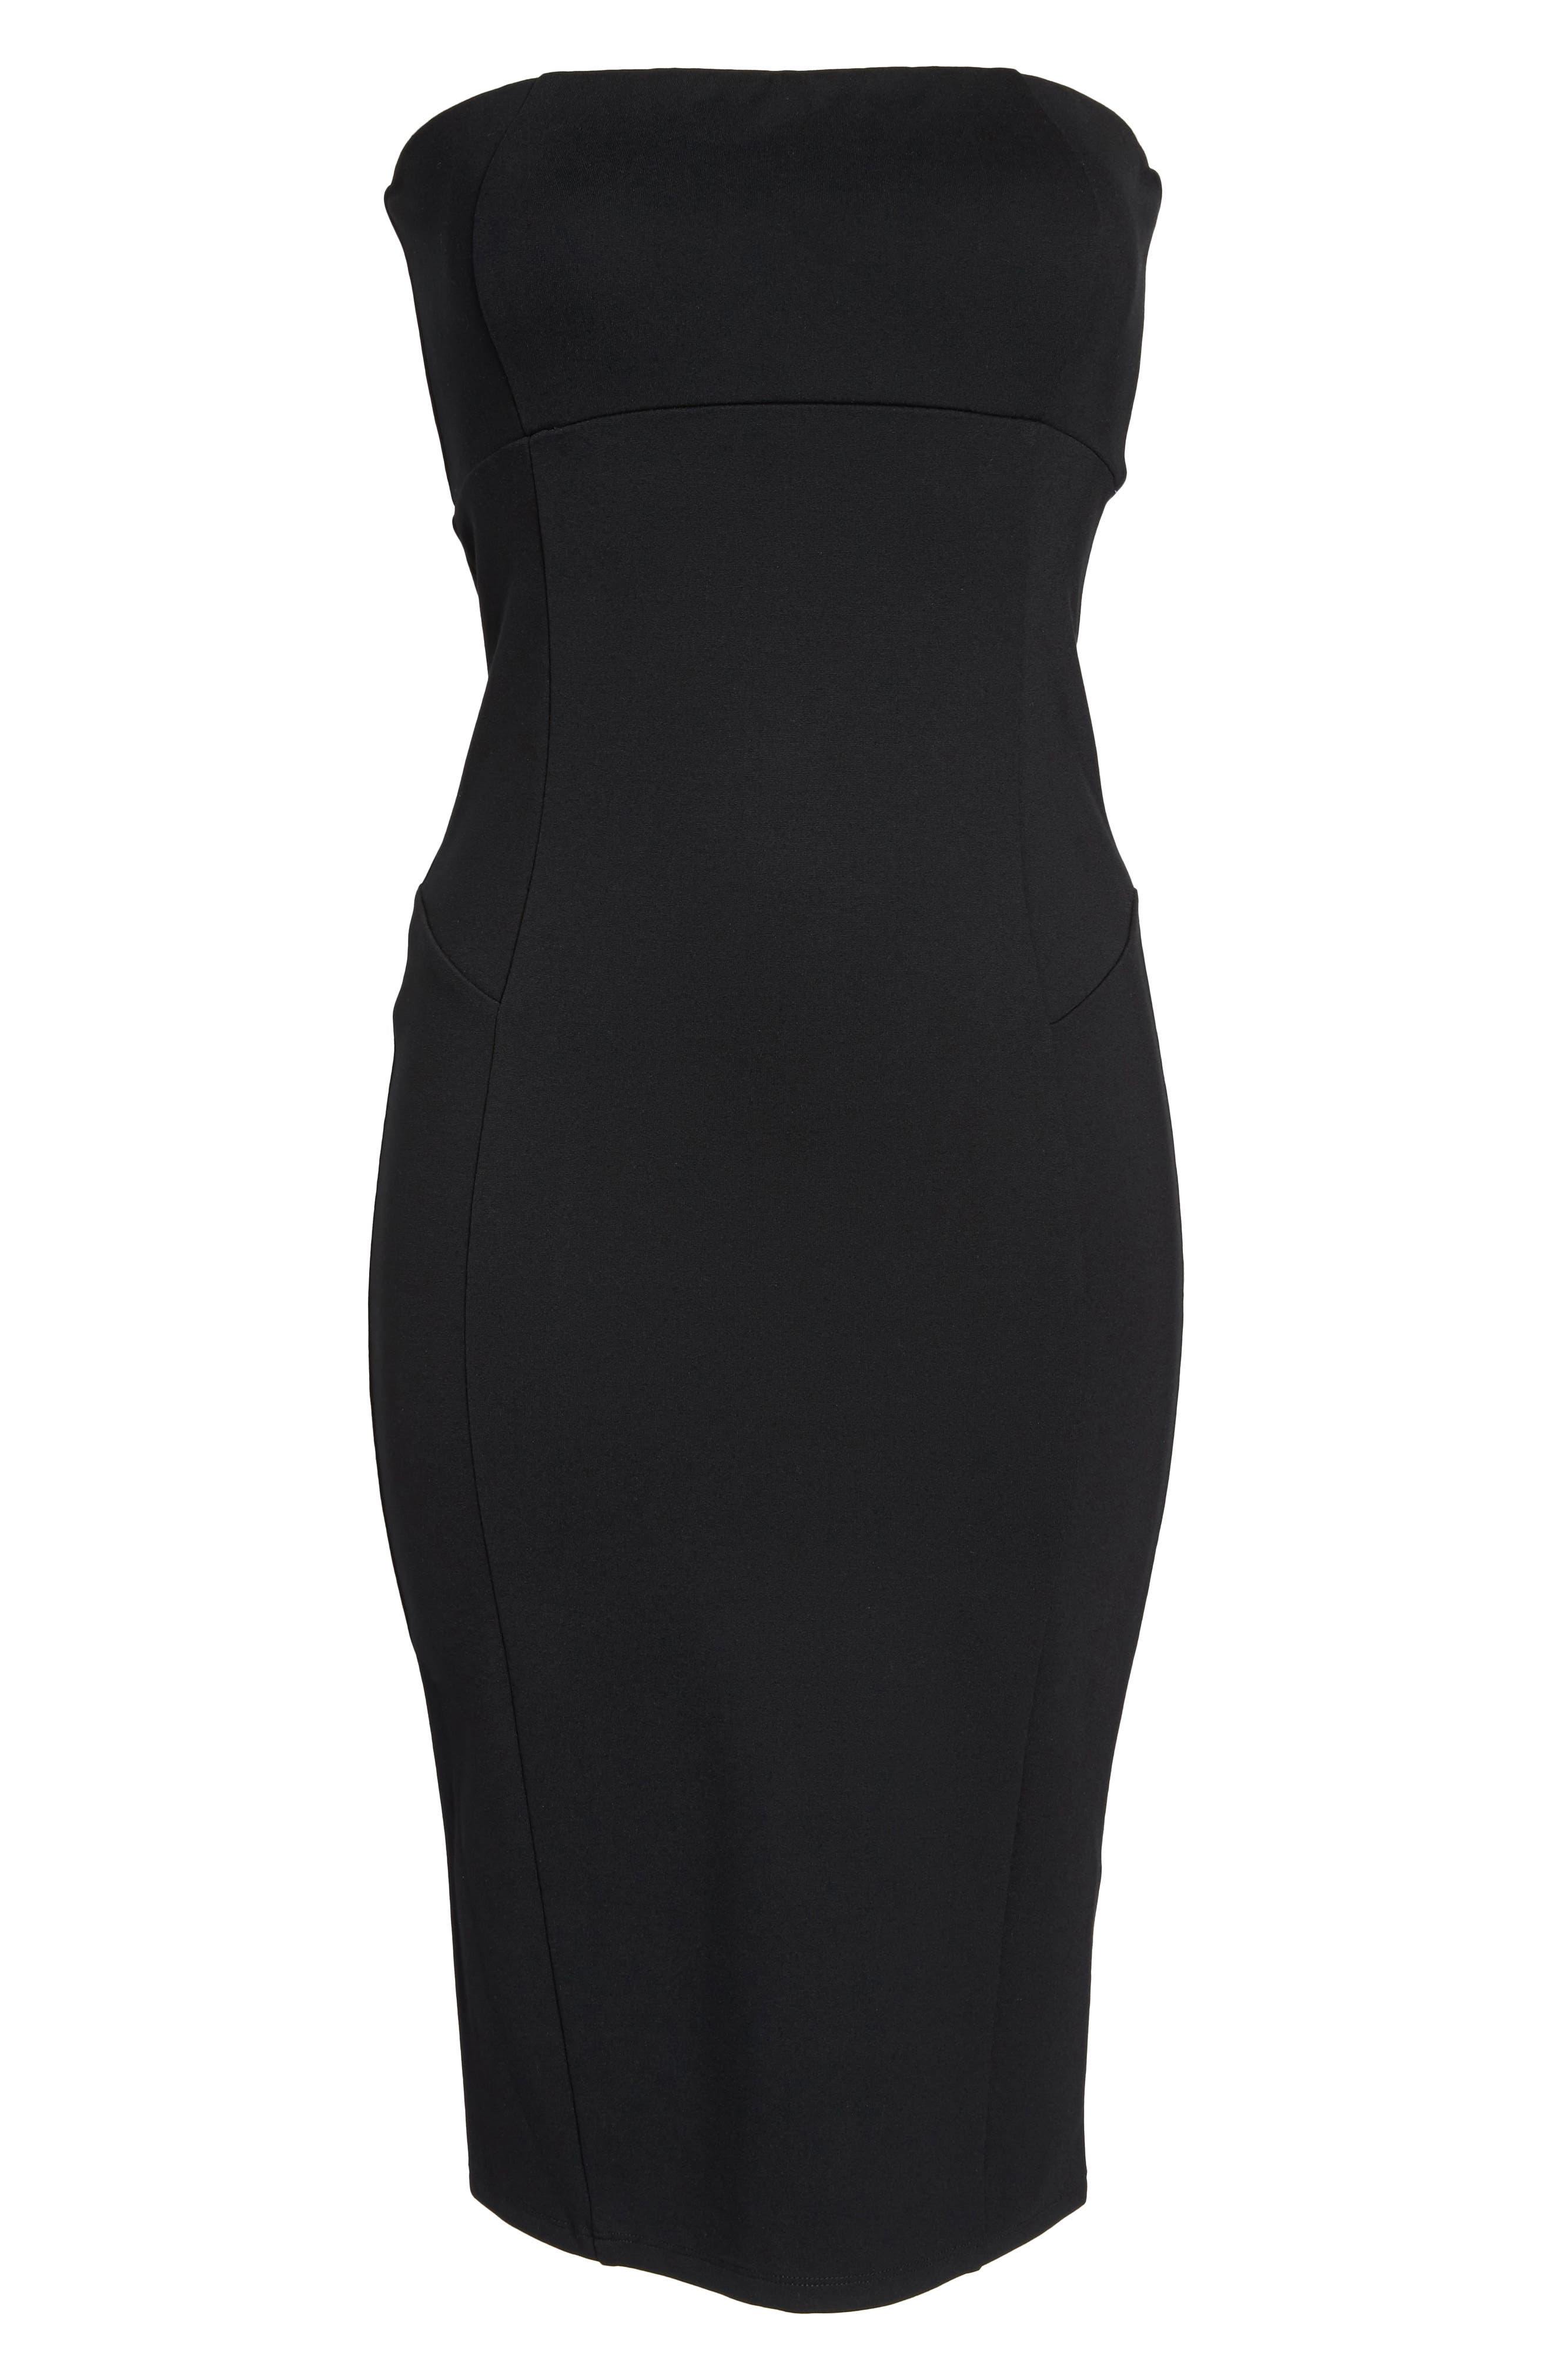 Brianna Strapless Knit Body-Con Dress,                             Alternate thumbnail 6, color,                             Black